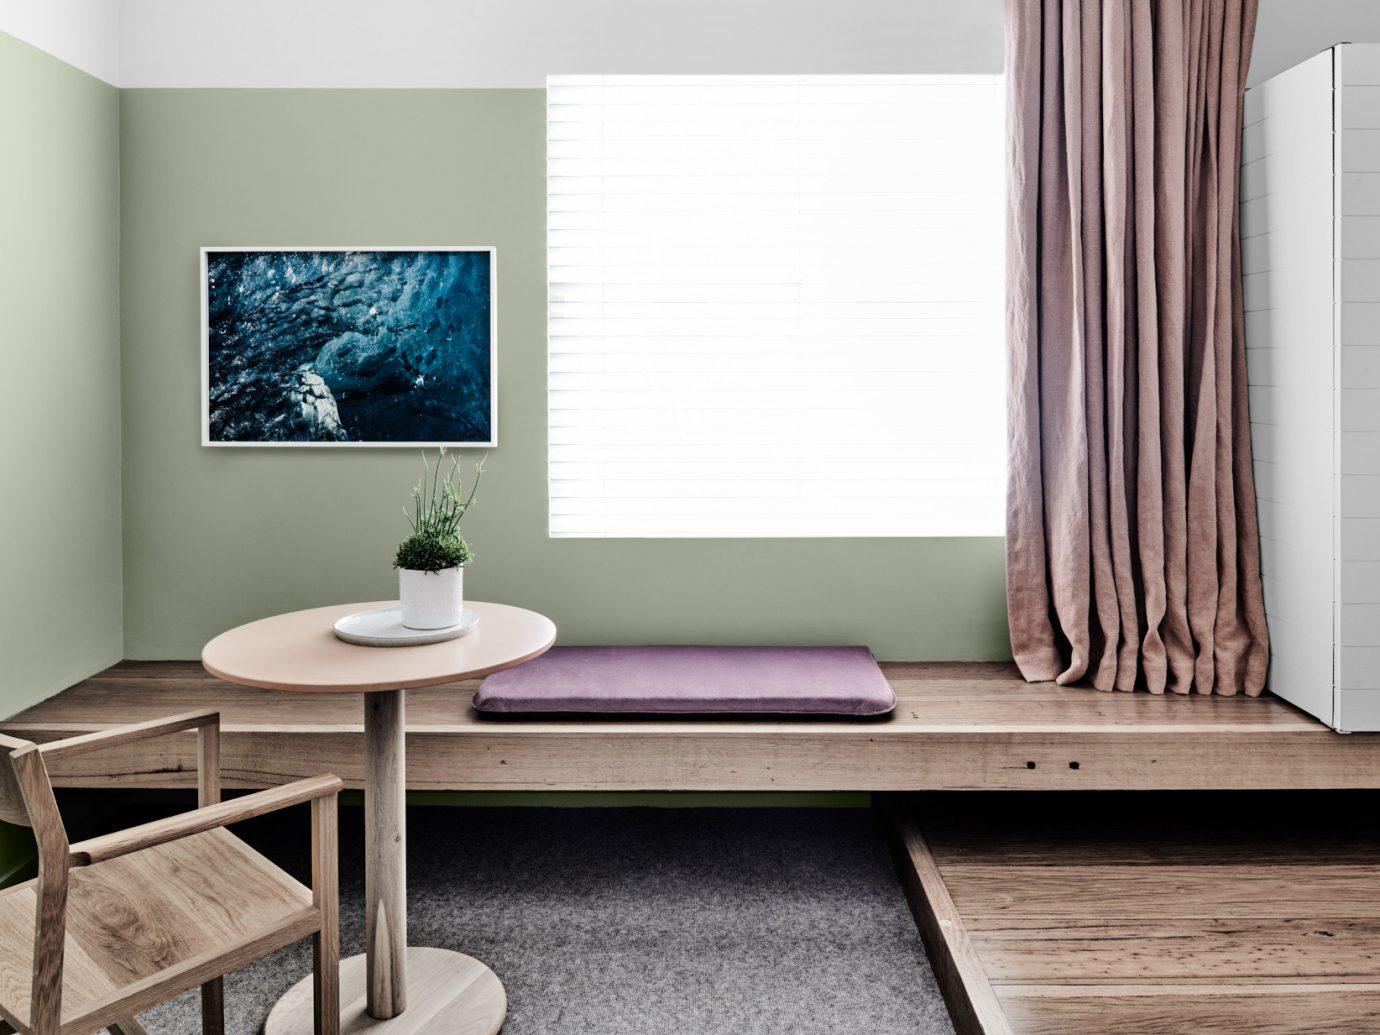 Australia Hotels Melbourne wall floor indoor furniture room interior design table living room product design wood coffee table home interior designer flooring window